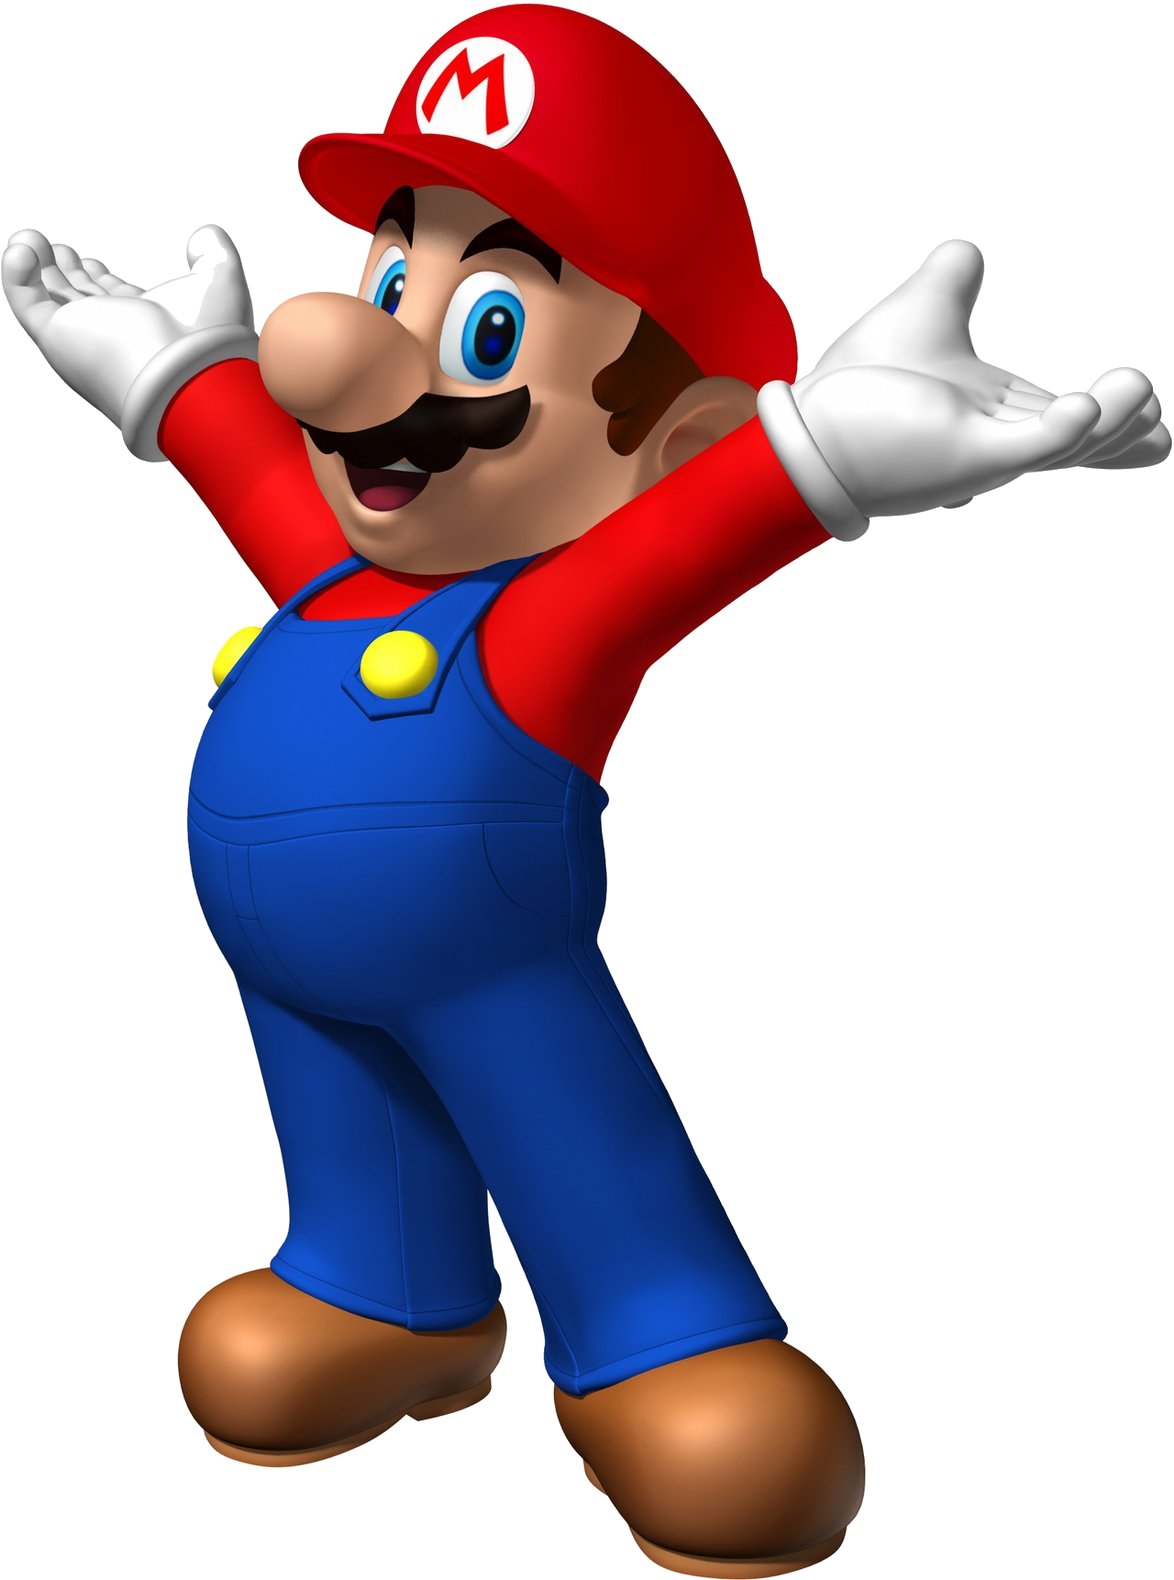 Mario Extreme Dodgeball!